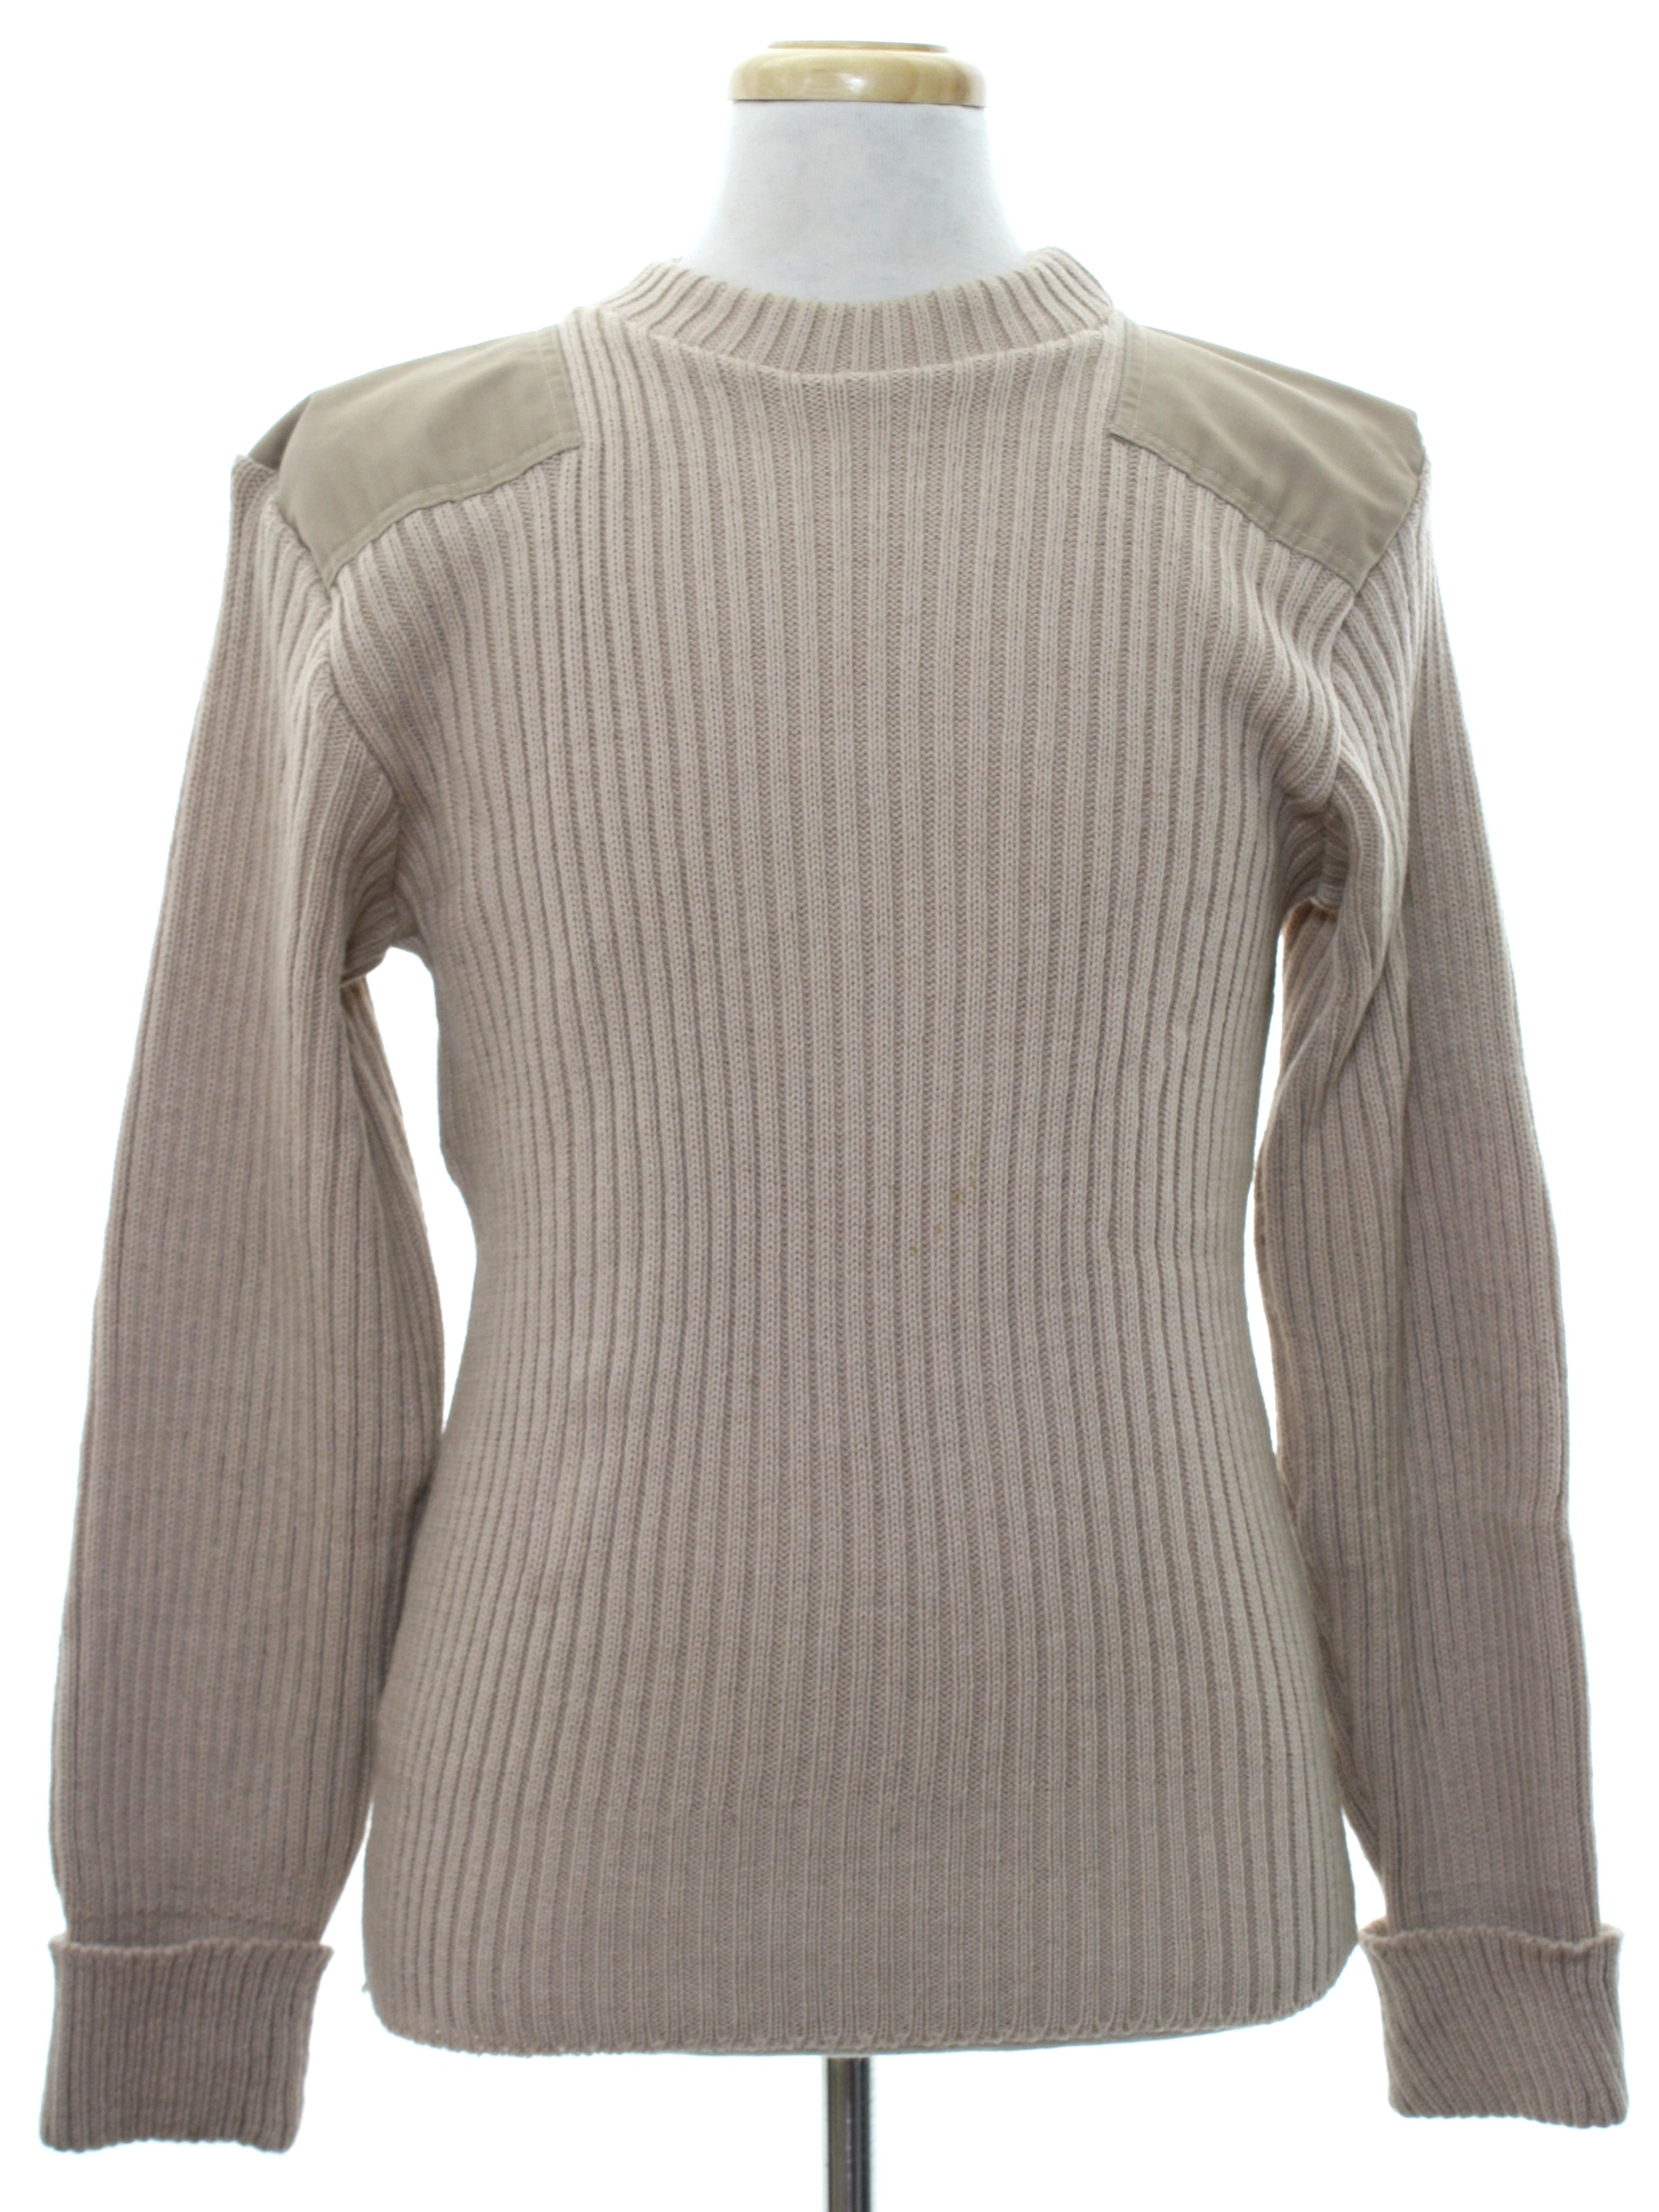 Eighties Vintage Sweater: 80s -Brigade Quarter Masters- Mens light ...